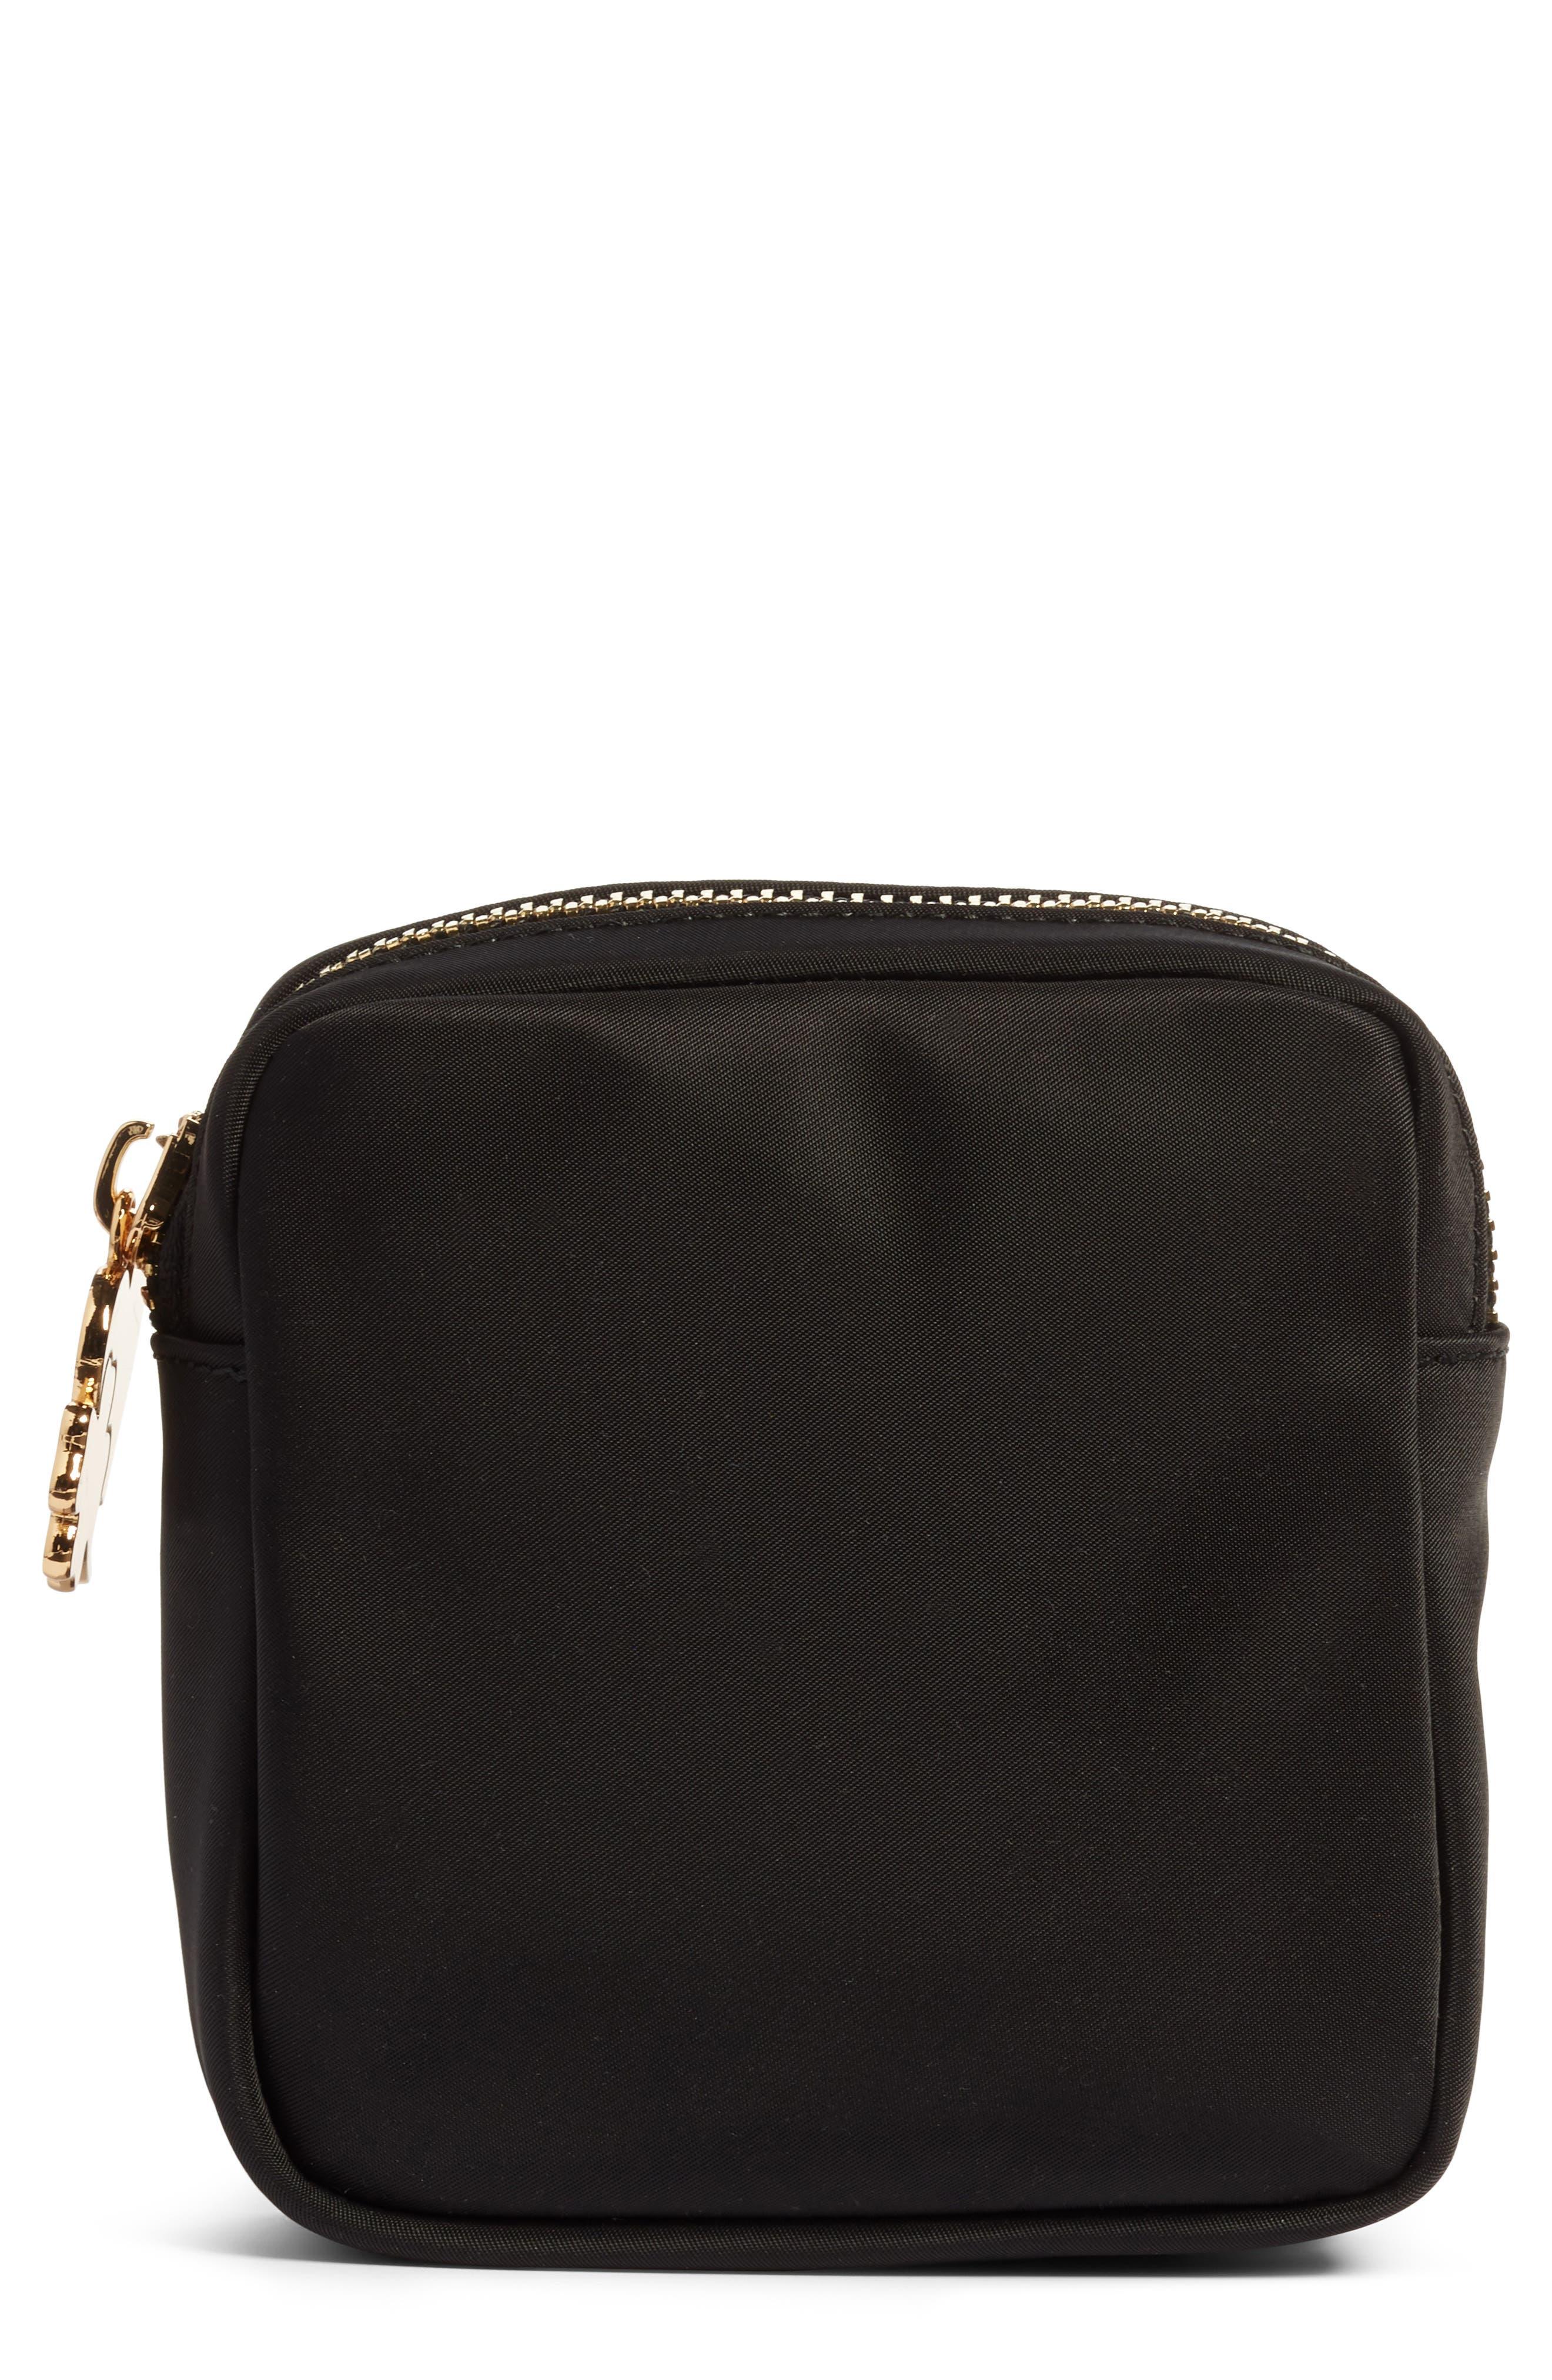 STONEY CLOVER LANE Nylon Mini Pouch in Black